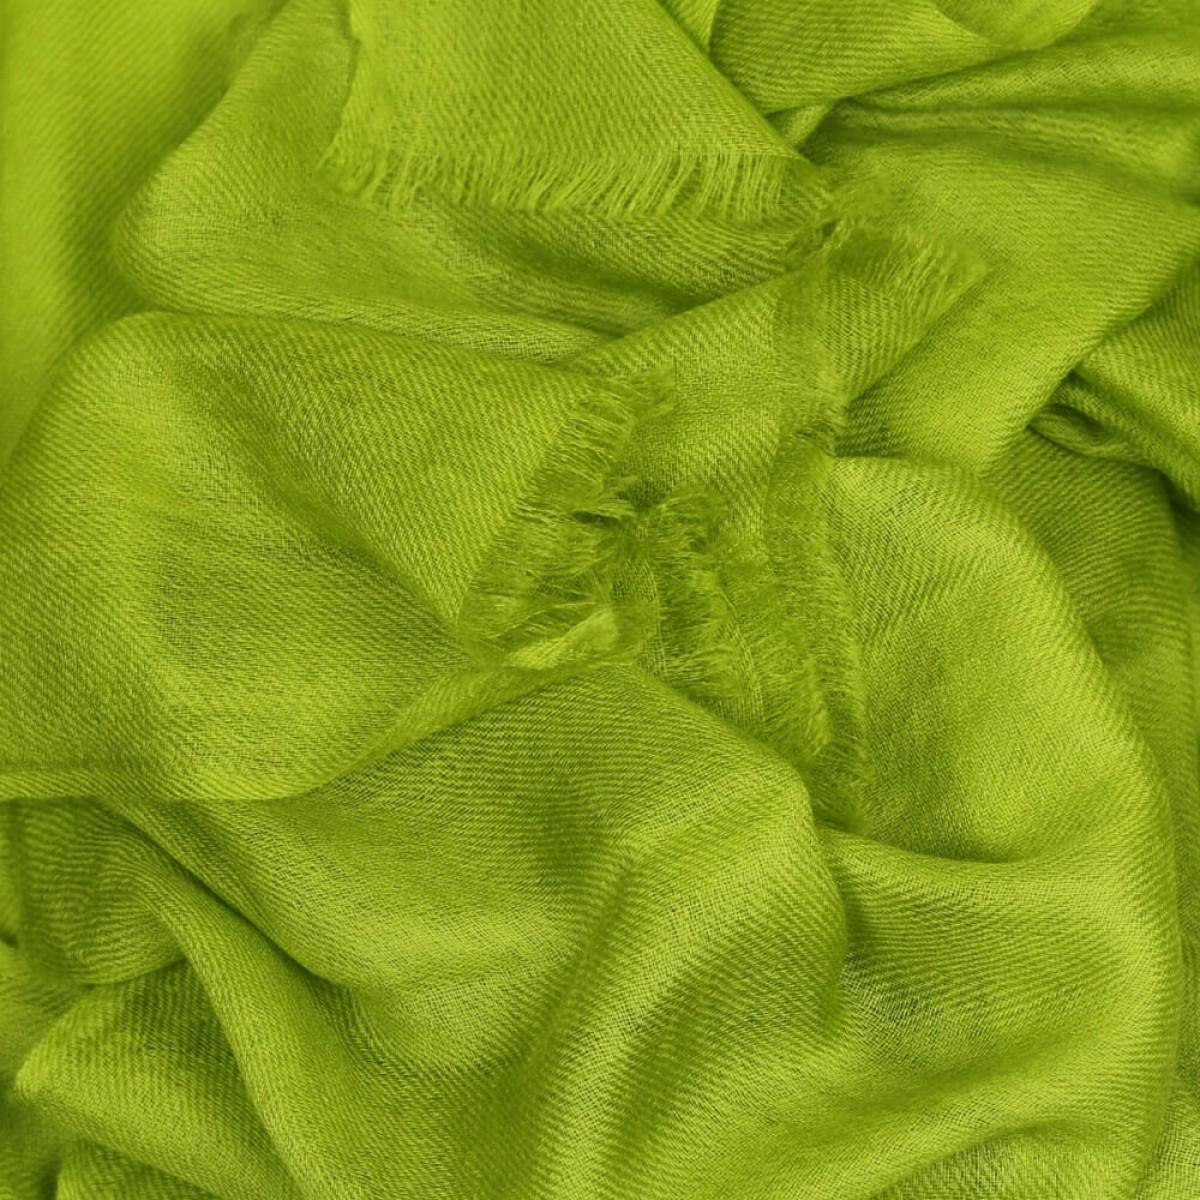 Sheer Pashmina Scarf - Spring Sprout Green